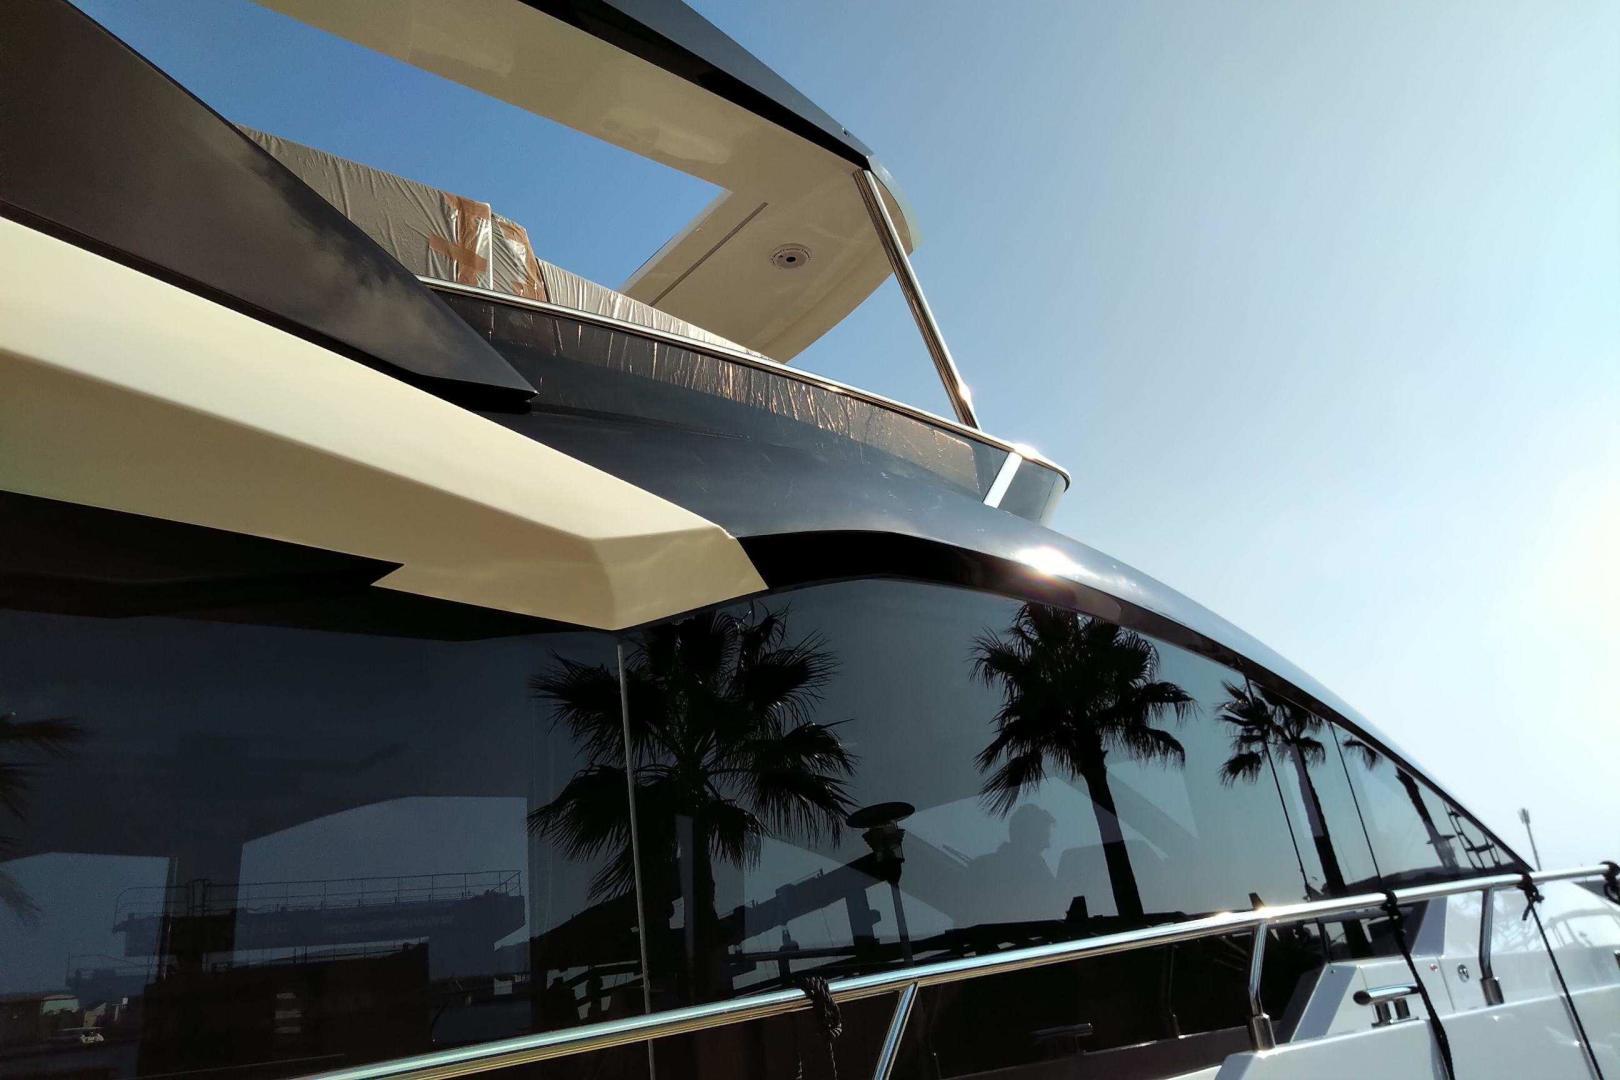 Astondoa-66 Flybridge 2020-Serenity New Rochelle-New York-United States-1489305 | Thumbnail